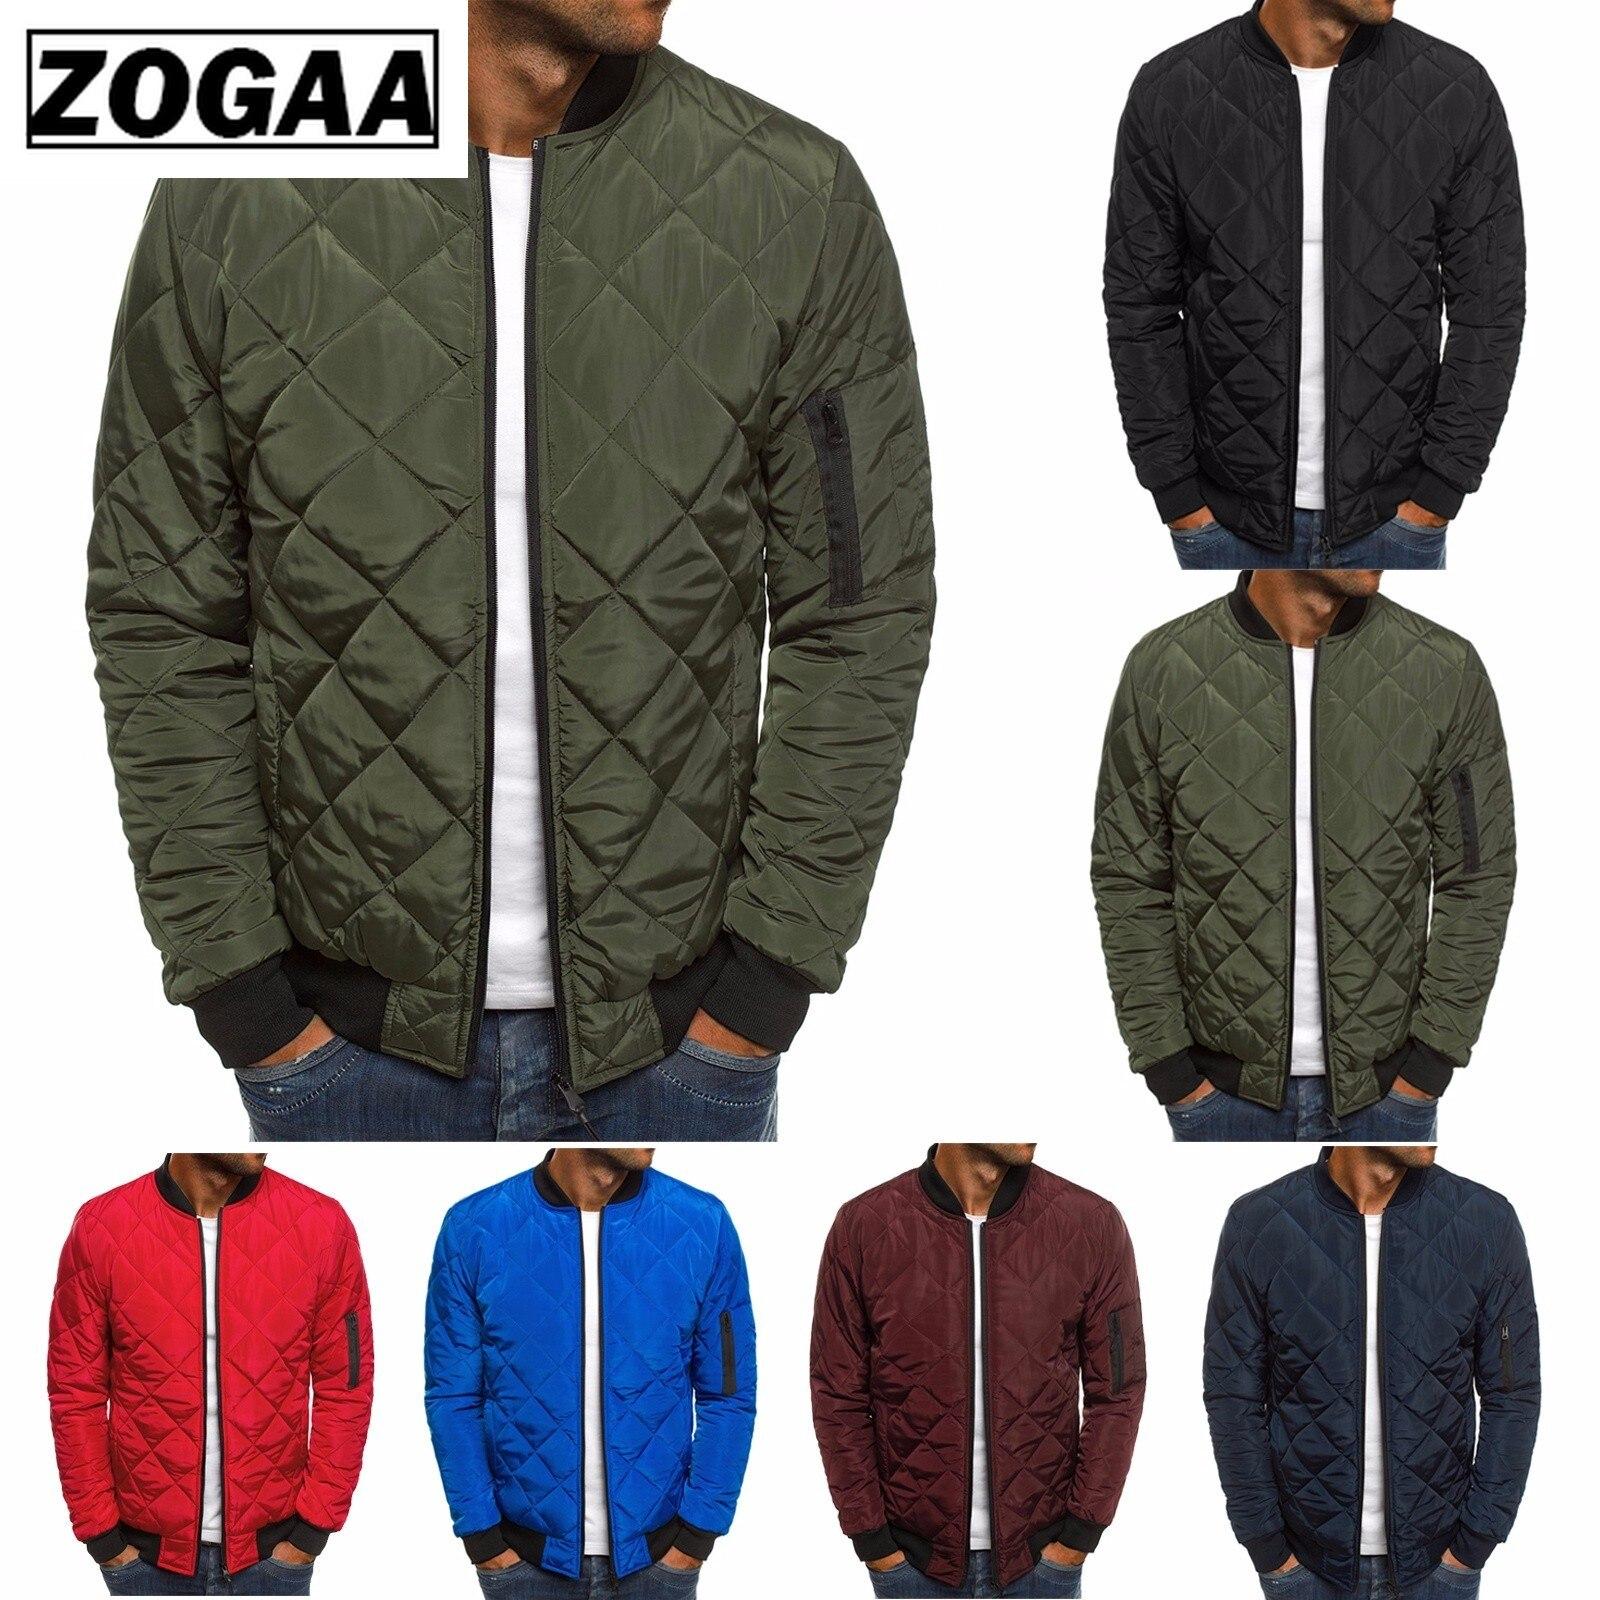 ZOGAA Men   Parkas   Plaid Jacket Men's Clothes Wind Breaker Solid   Parkas   Hombre Overcoat Autumn Winter Clothes Zipper Jackets